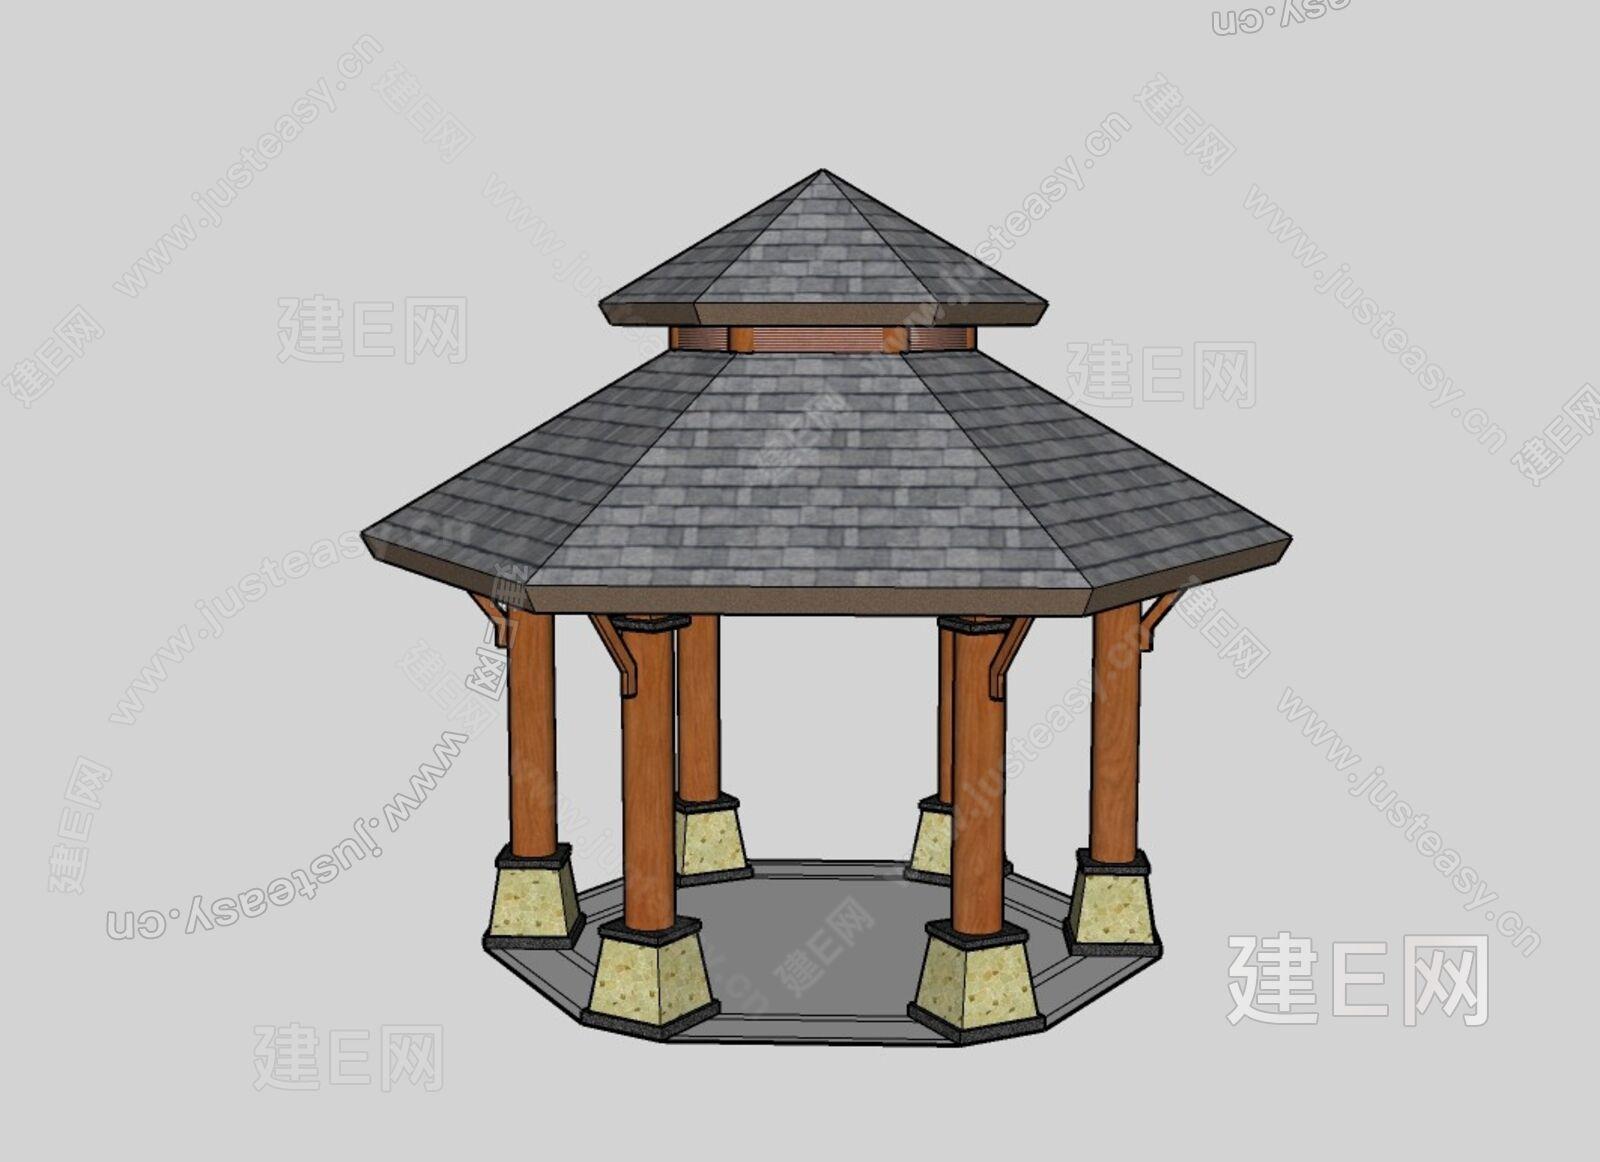 木亭sketchup模型